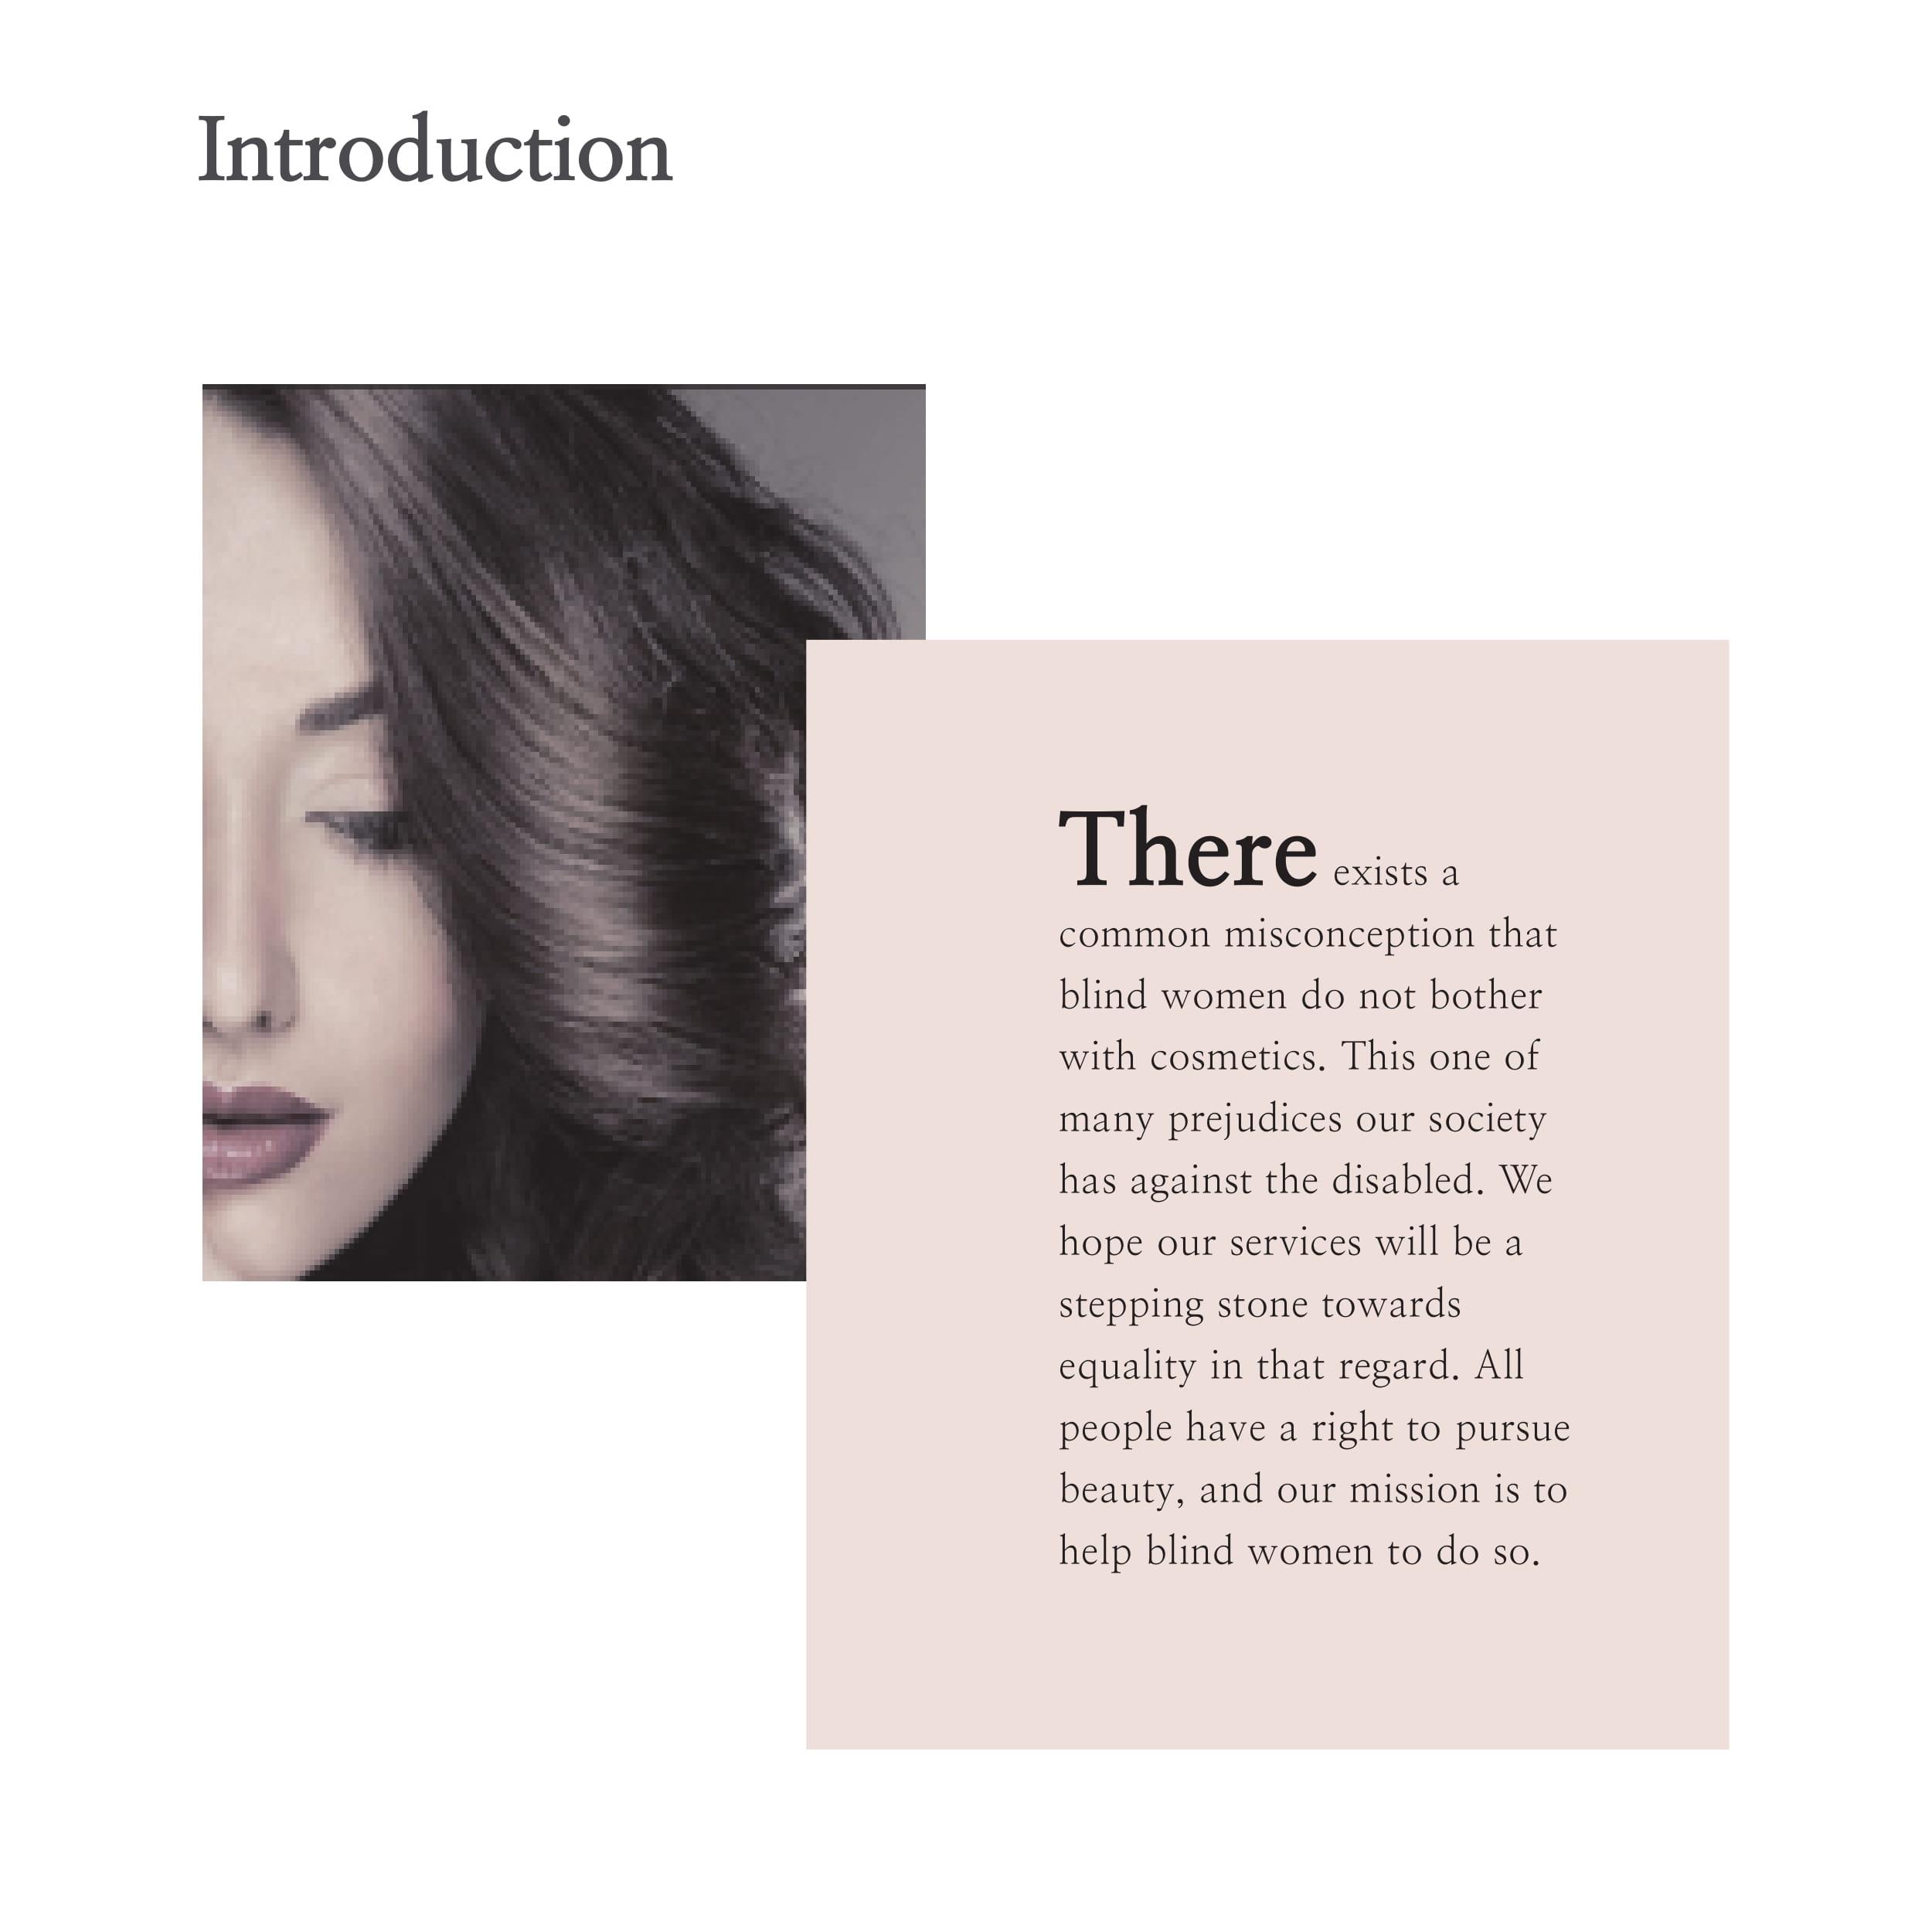 online profile_end-02.jpg